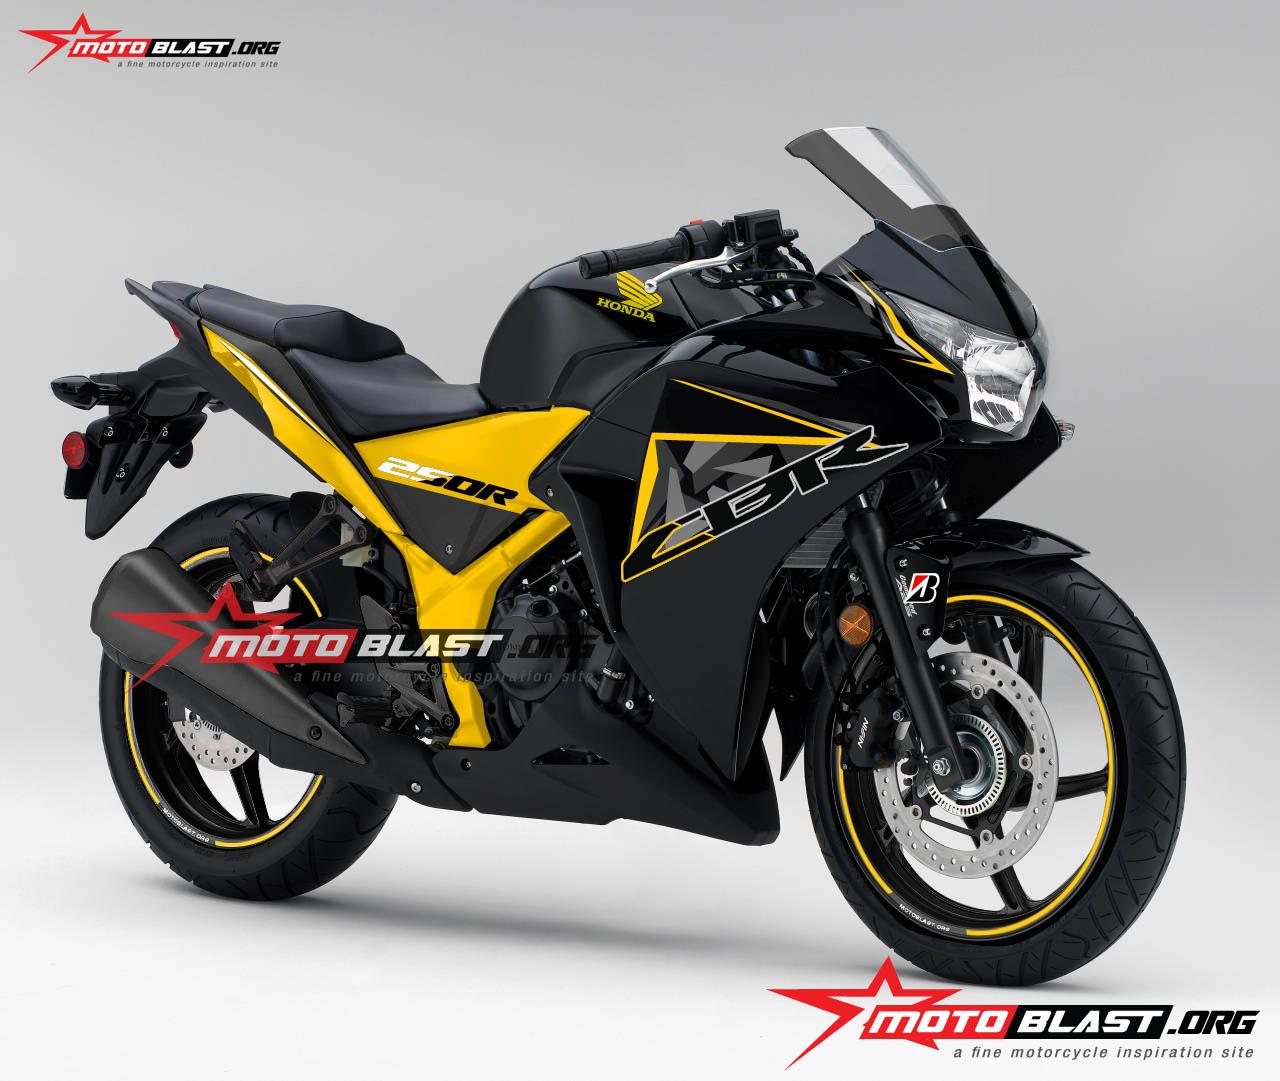 konsep modifikasi custom honda cbrr thailand motoblast